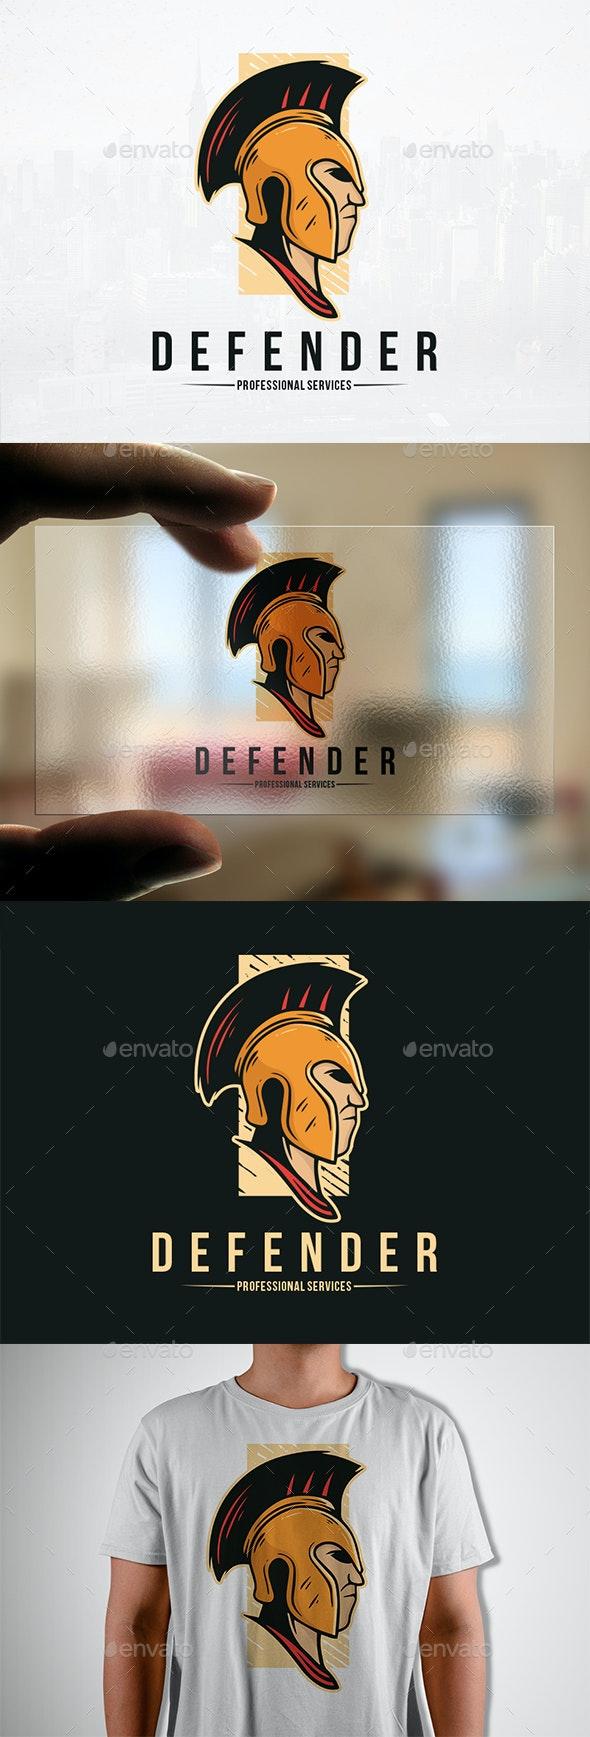 Warrior Defender Logo Template - Humans Logo Templates